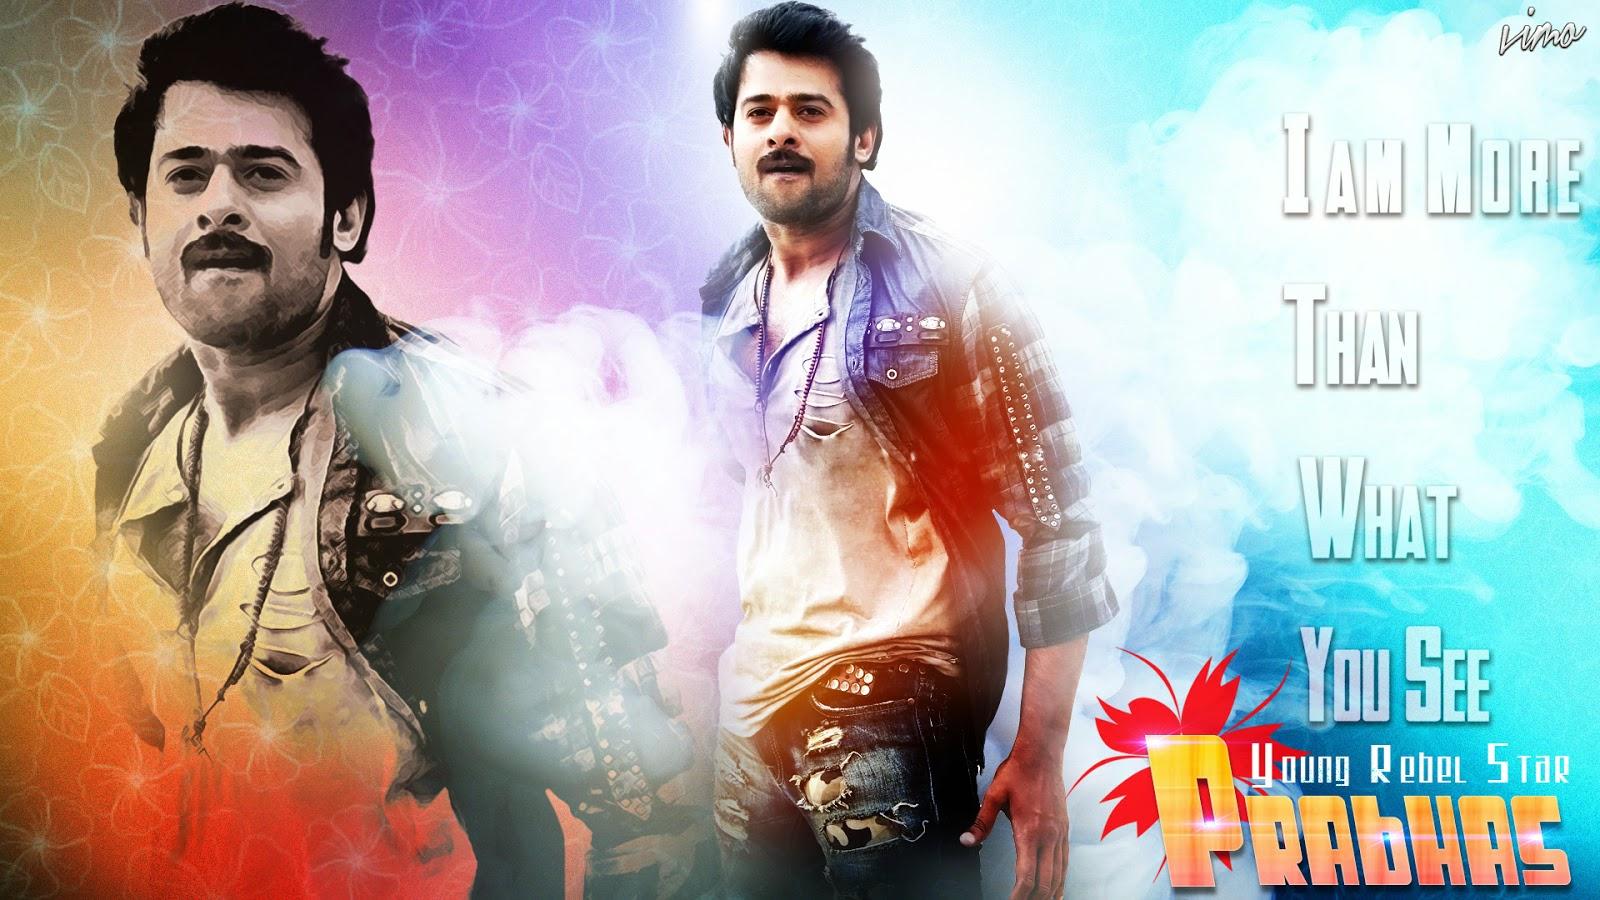 Best Actor Prabhas Hd Wallpaper: South Indian Actress Prabhas Raju HD Wallpaper Desktop